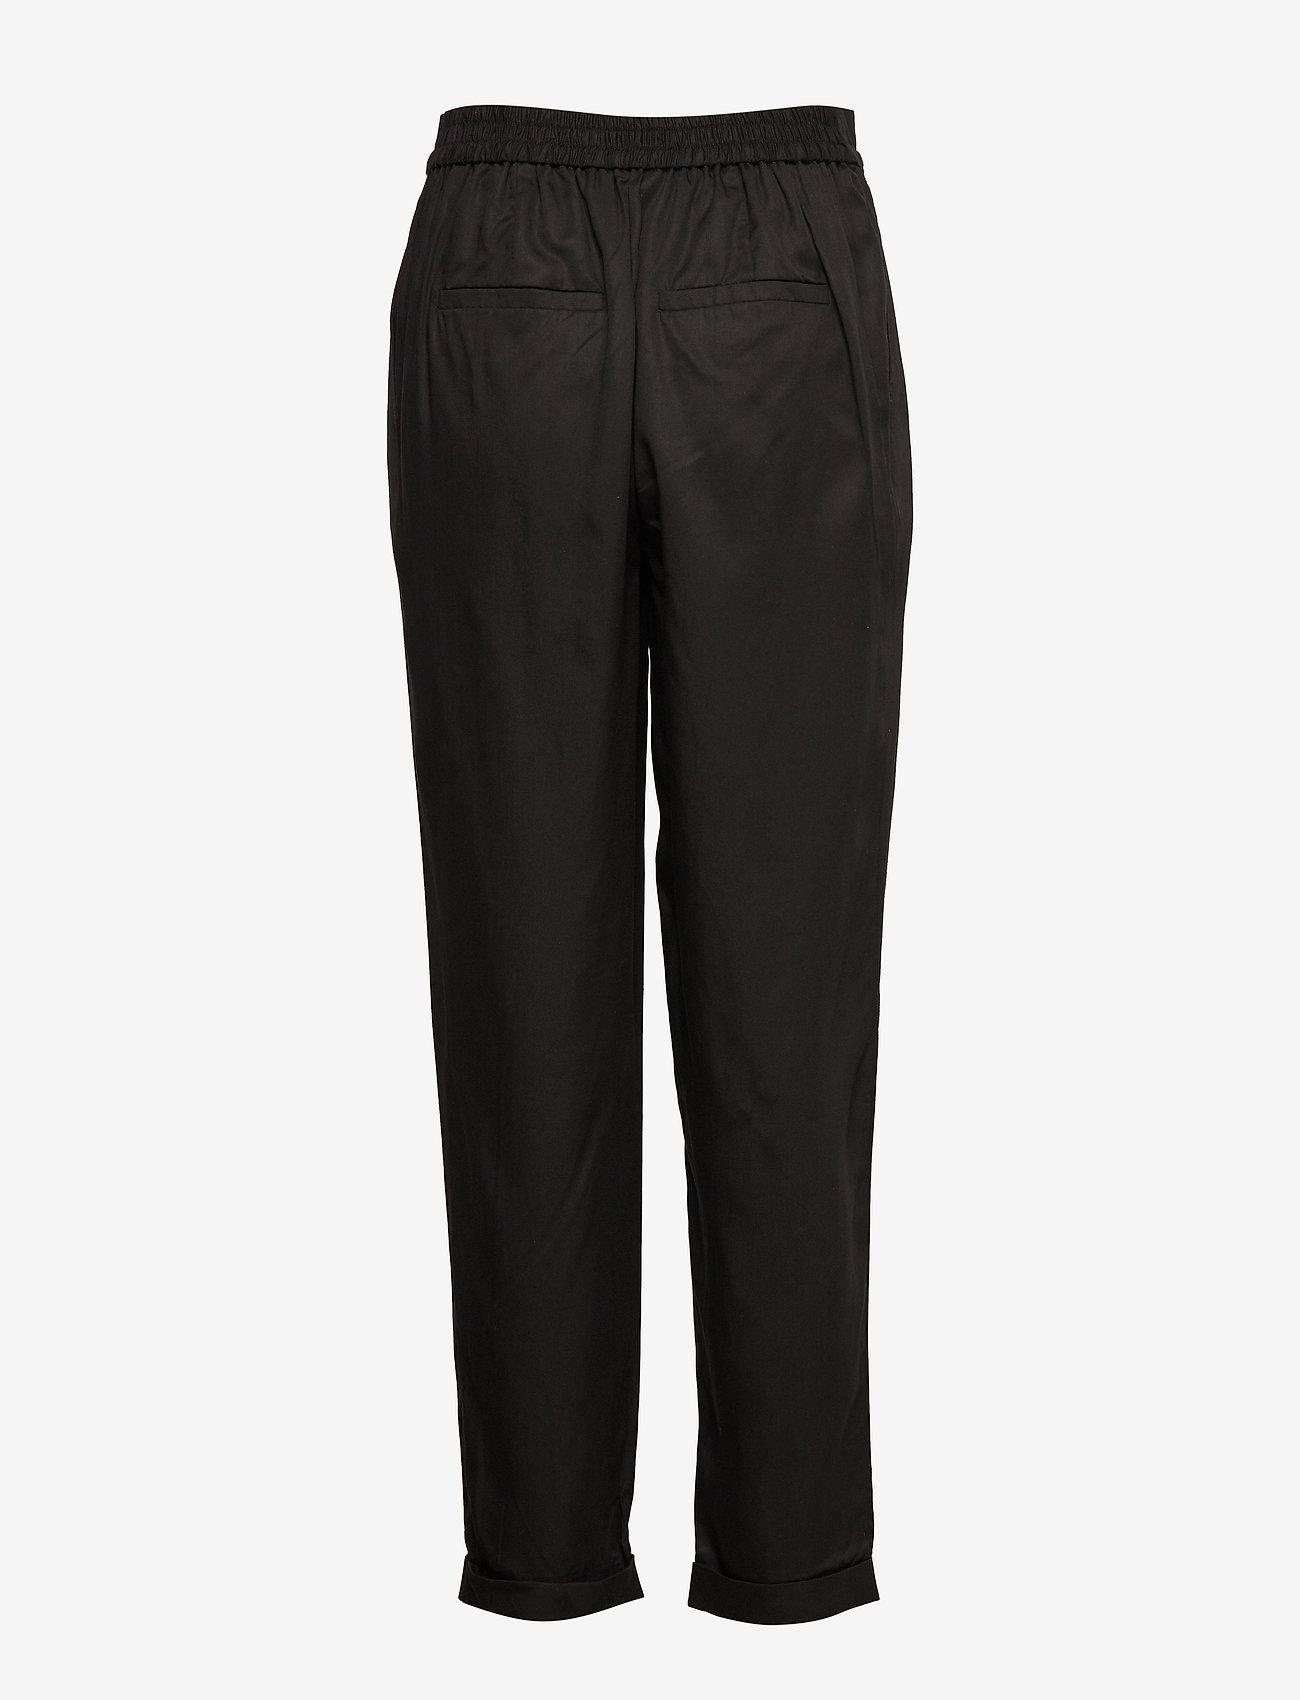 Selected Femme - SLFPORTA MW ANKLE PANT B - straight leg trousers - black - 1